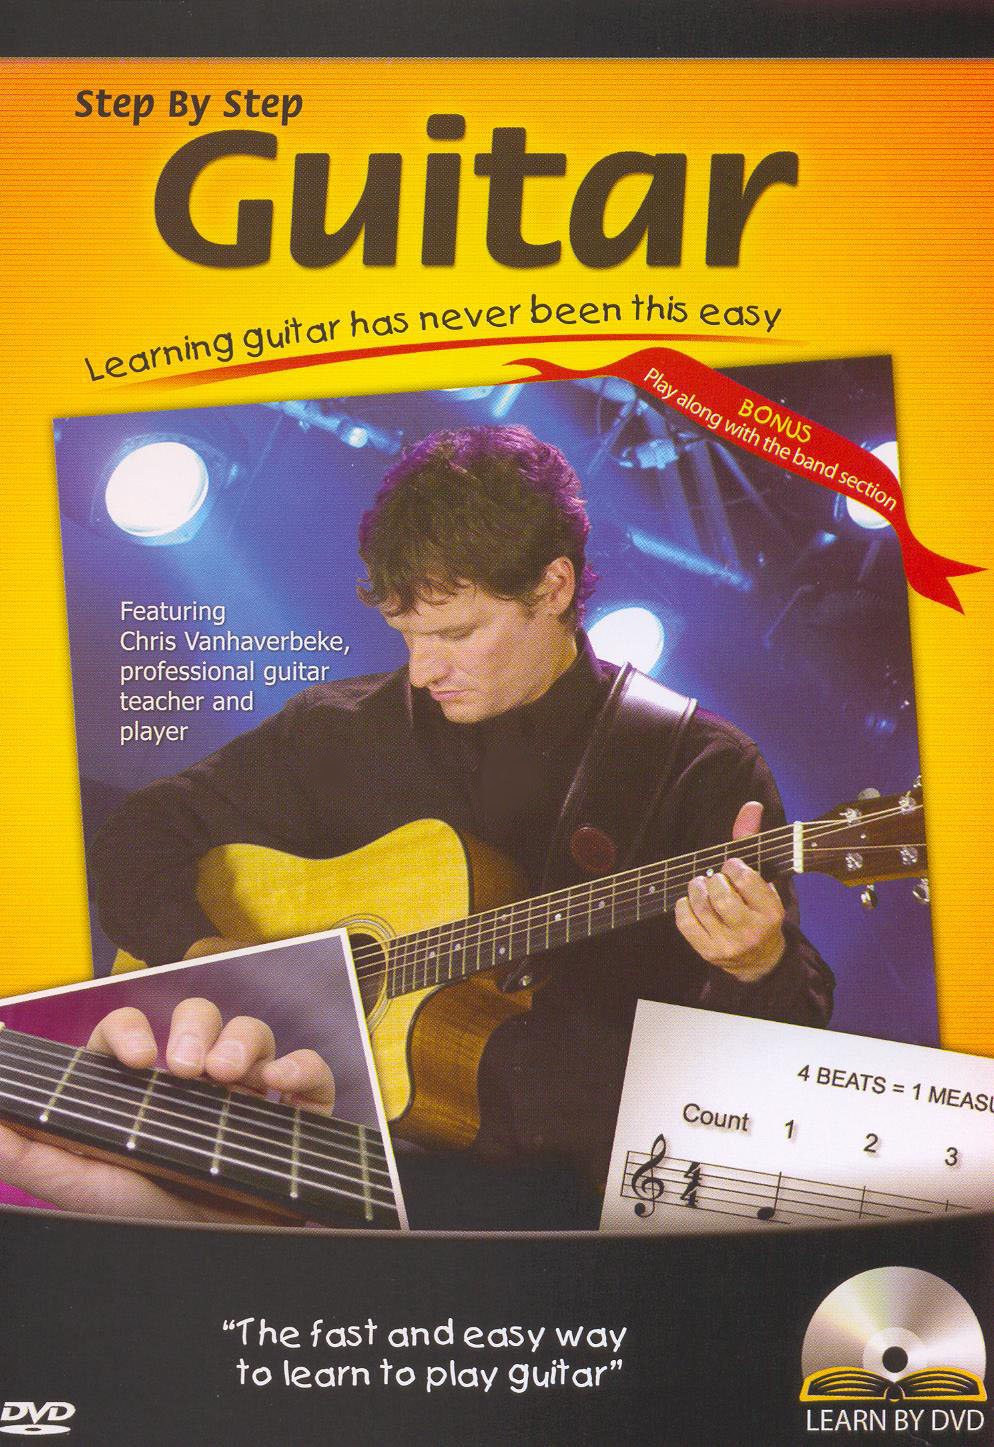 Step by Step: Guitar